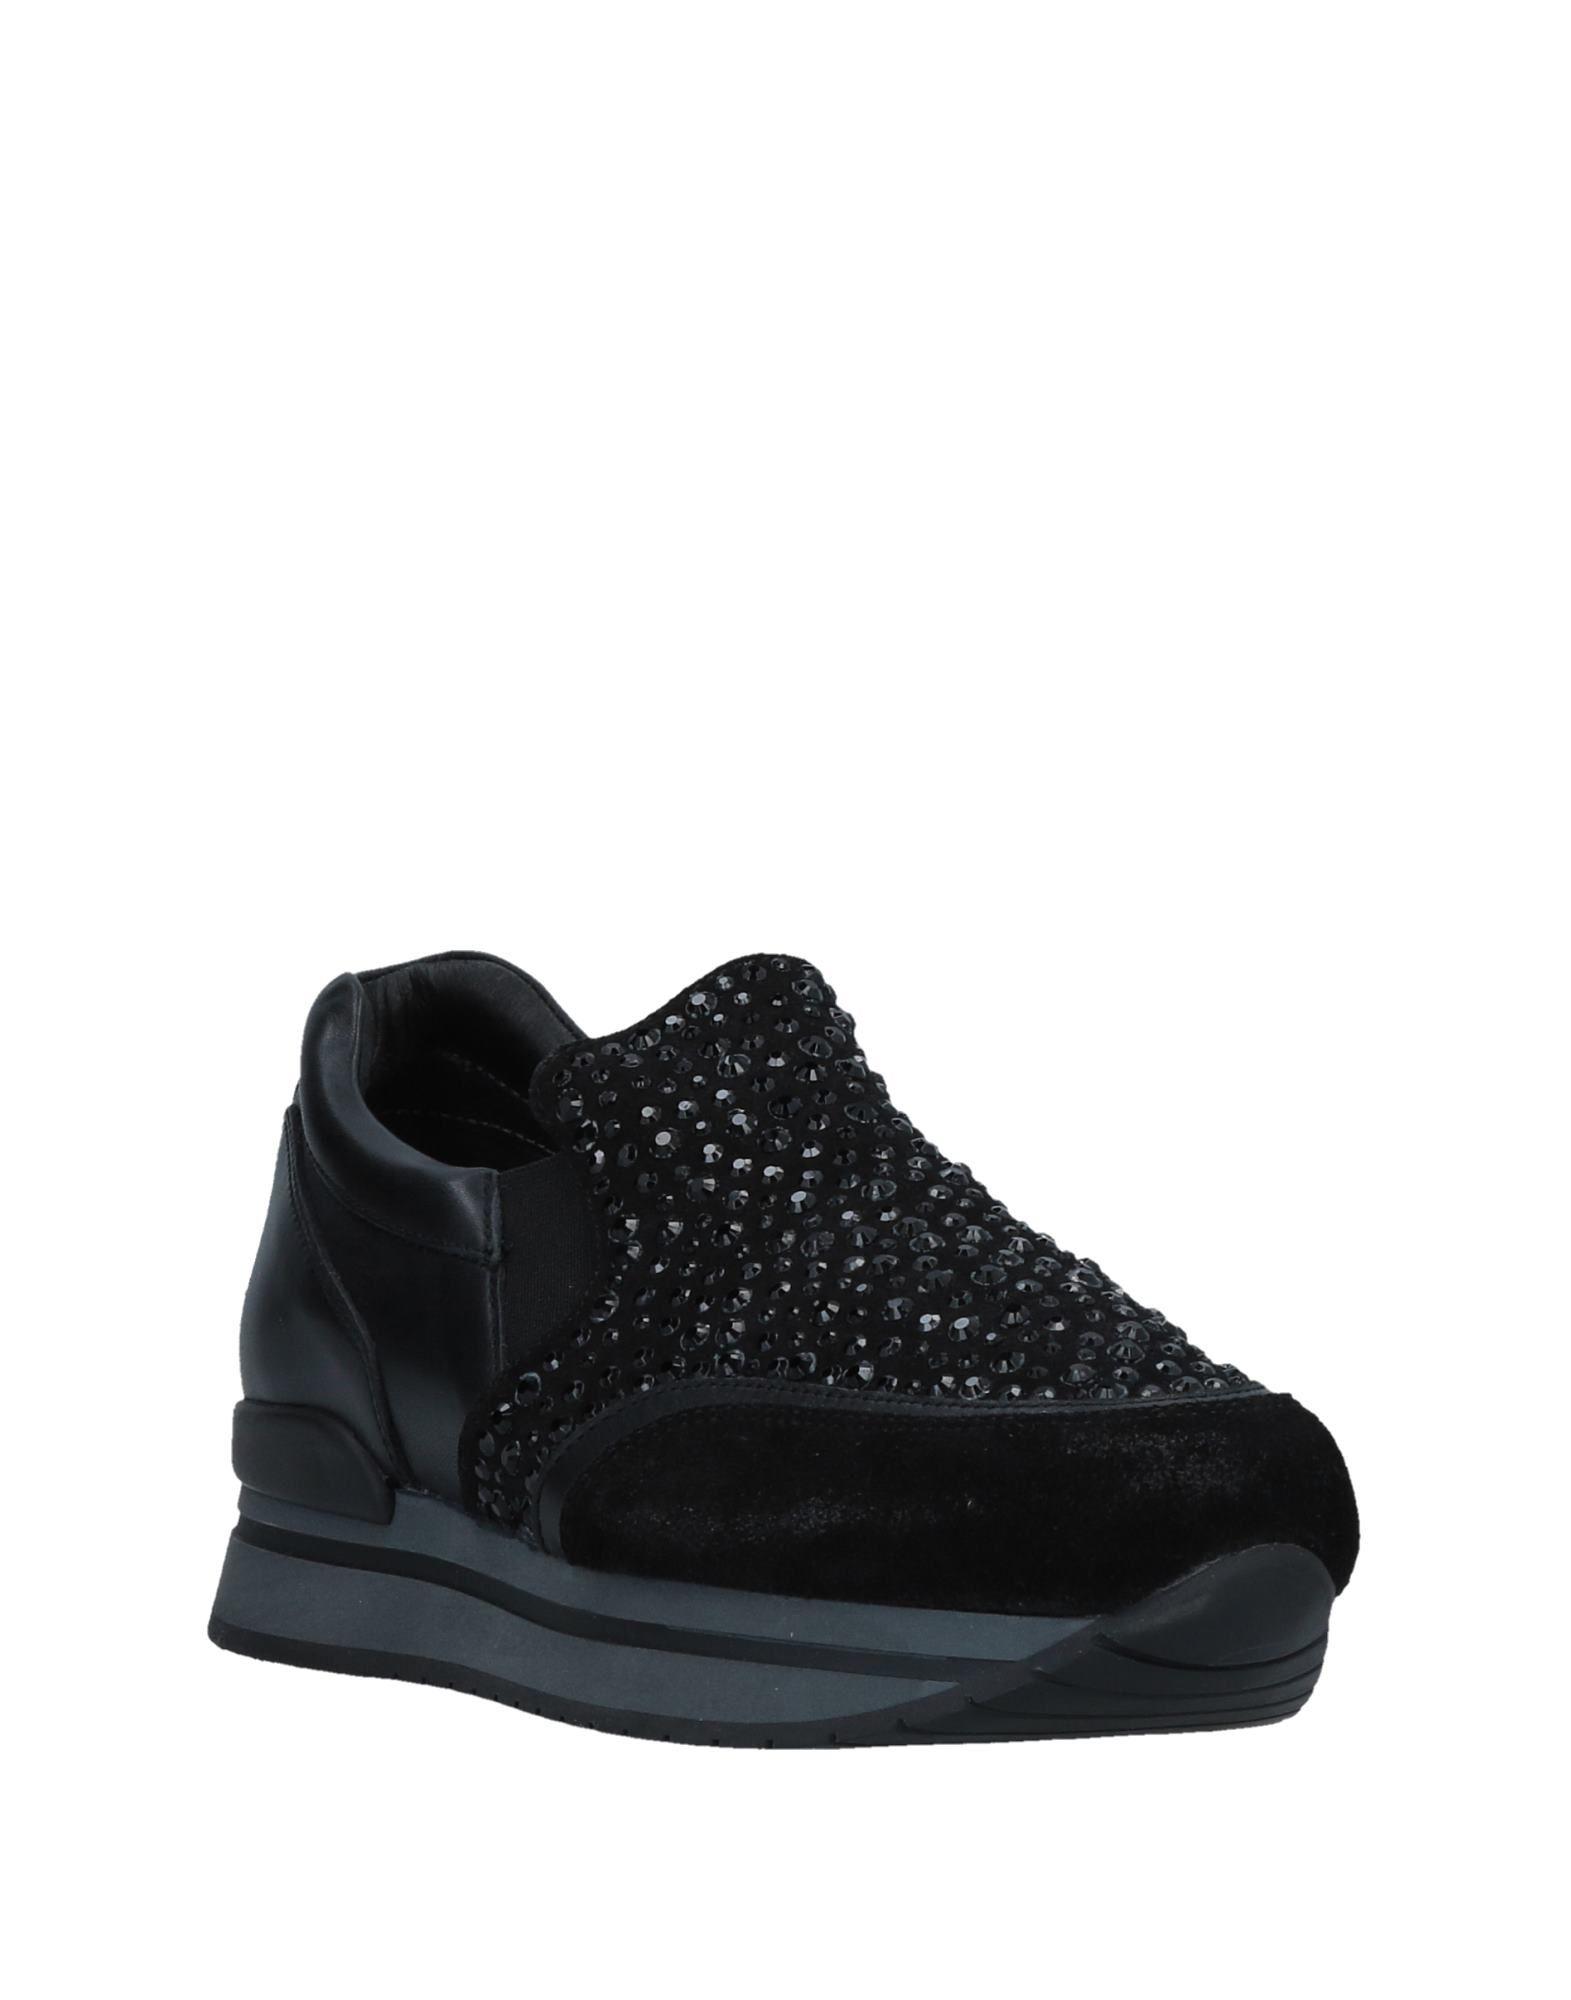 Janet Sport Sneakers - Women Janet Sport Sneakers Sneakers Sneakers online on  United Kingdom - 11507160AO aea30d